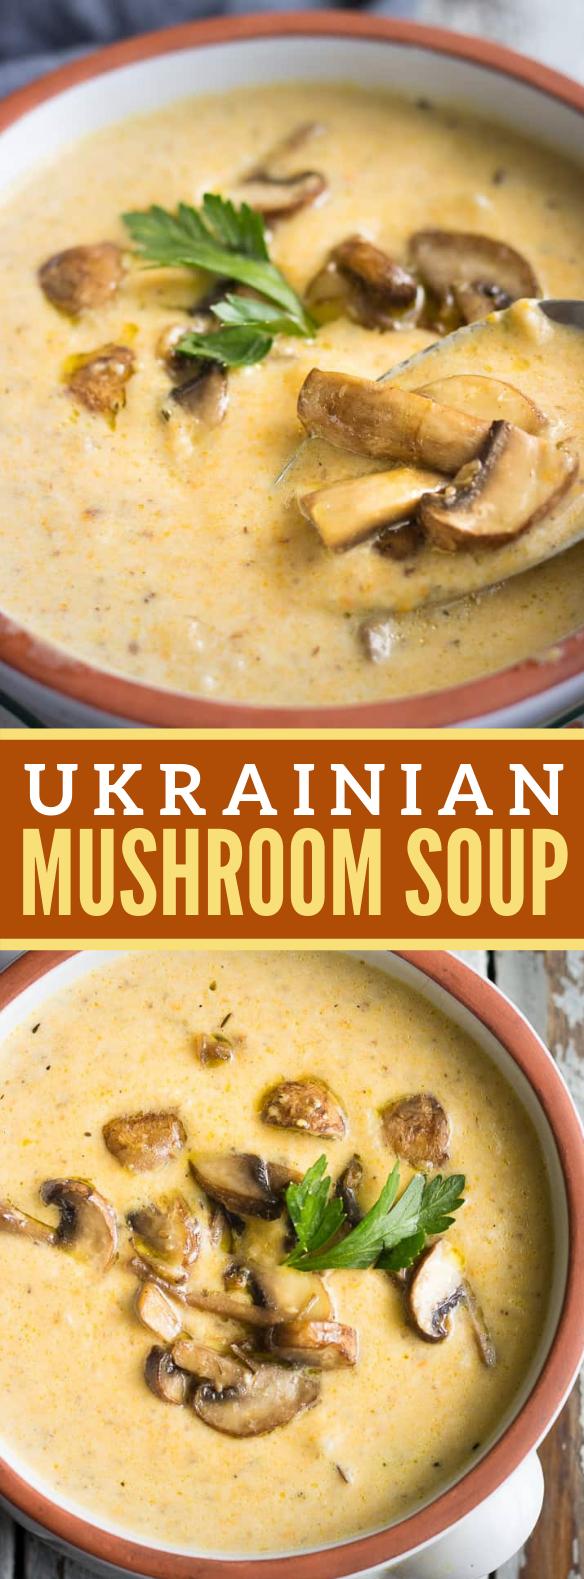 UKRAINIAN MUSHROOM SOUP #vegetarian #veggies